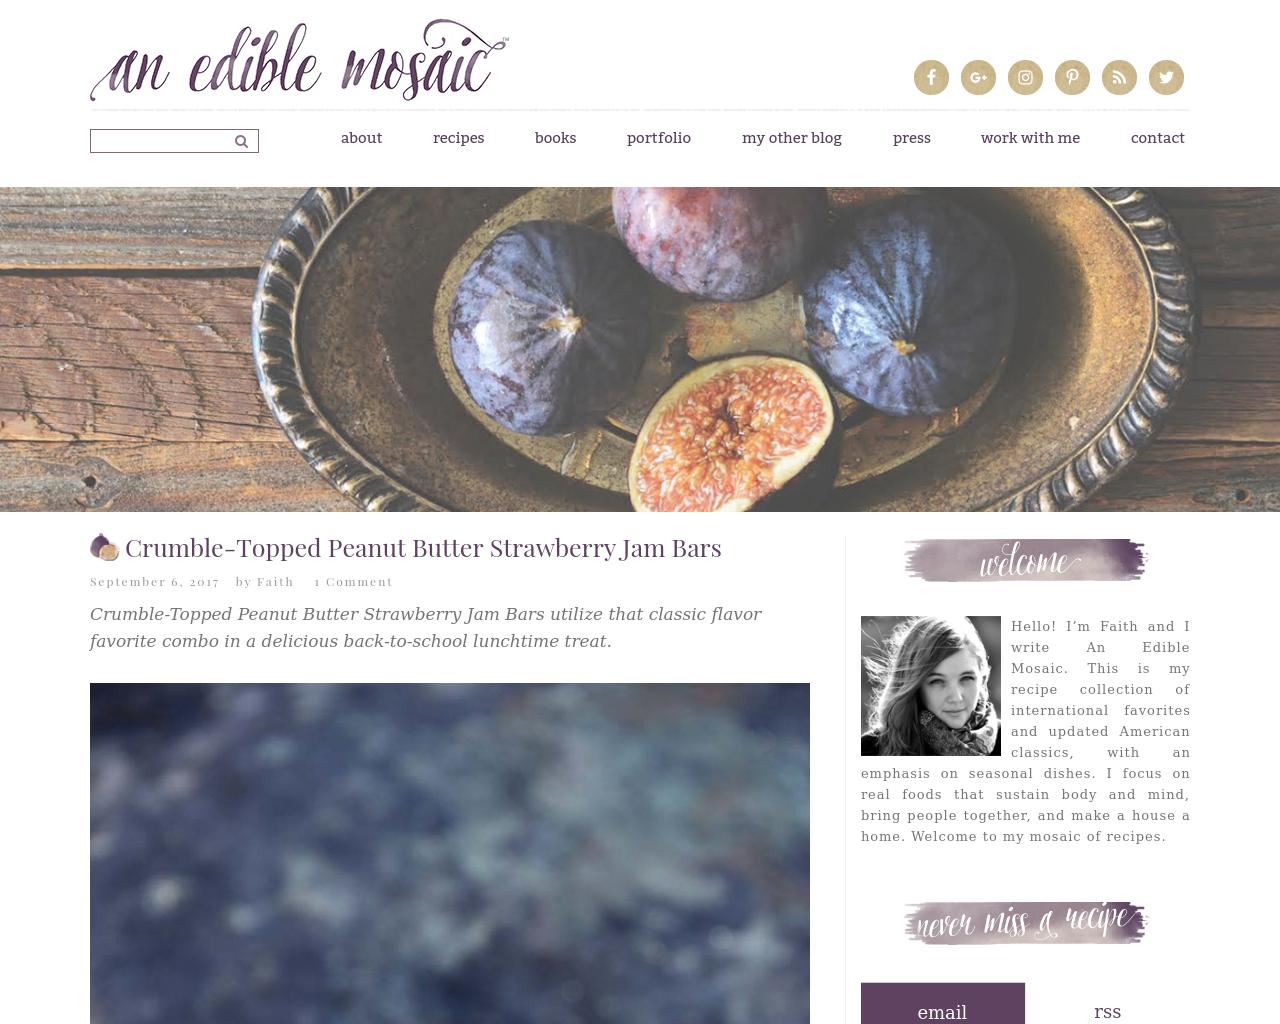 An-Edible-Mosaic-Advertising-Reviews-Pricing